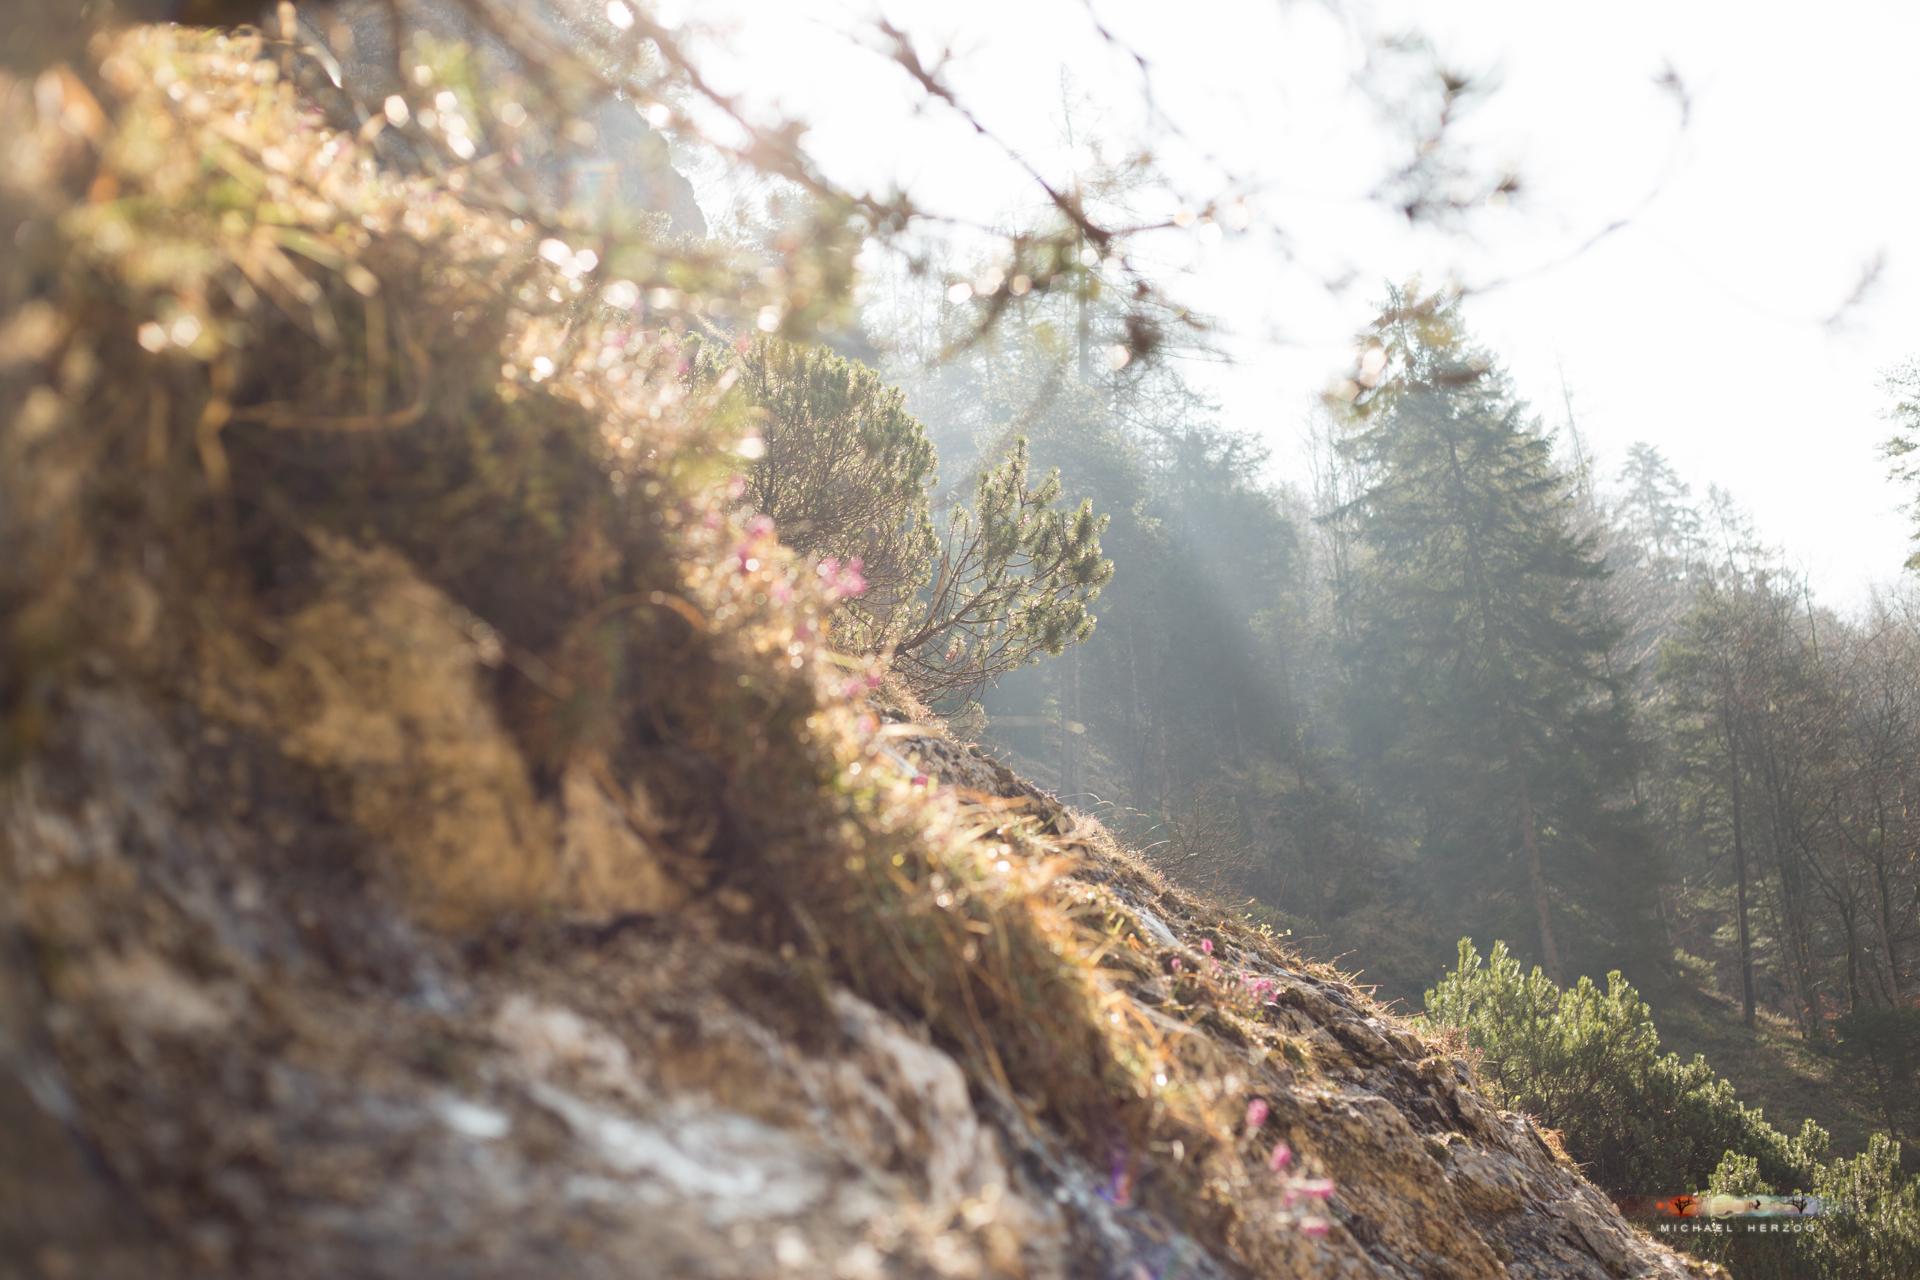 Wandern-AschauerKlamm2017_byMichaelHerzog-9564.jpg